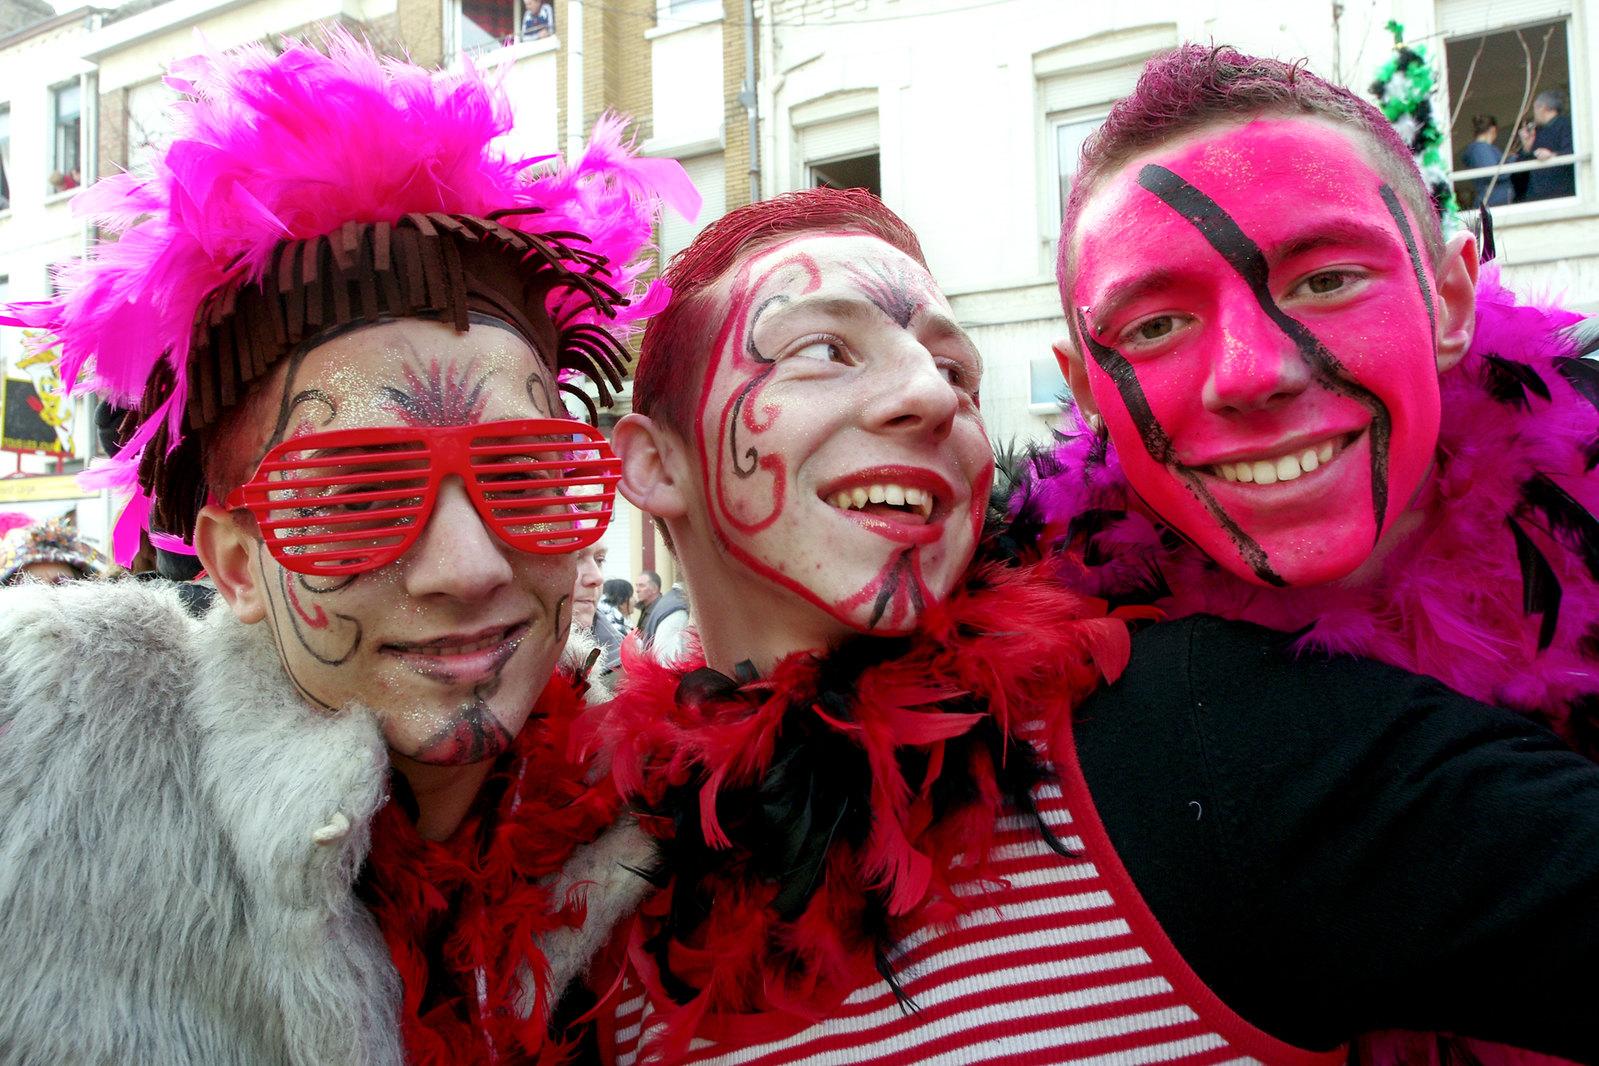 Carnaval de Dunkerque - Force rose et maquillage à rayure